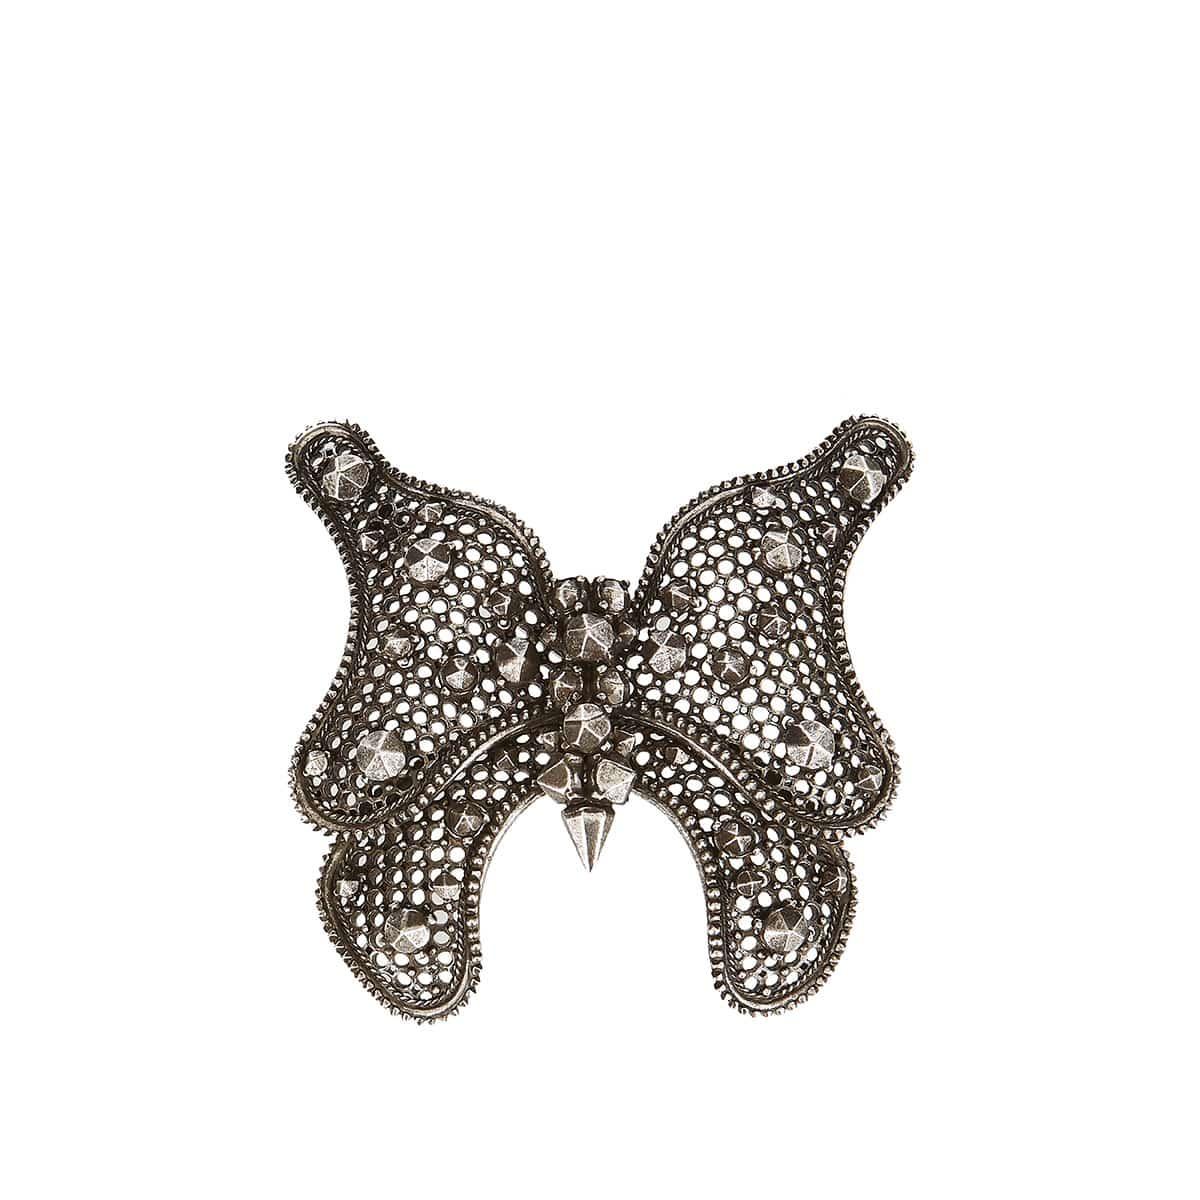 Studded brass butterfly brooch